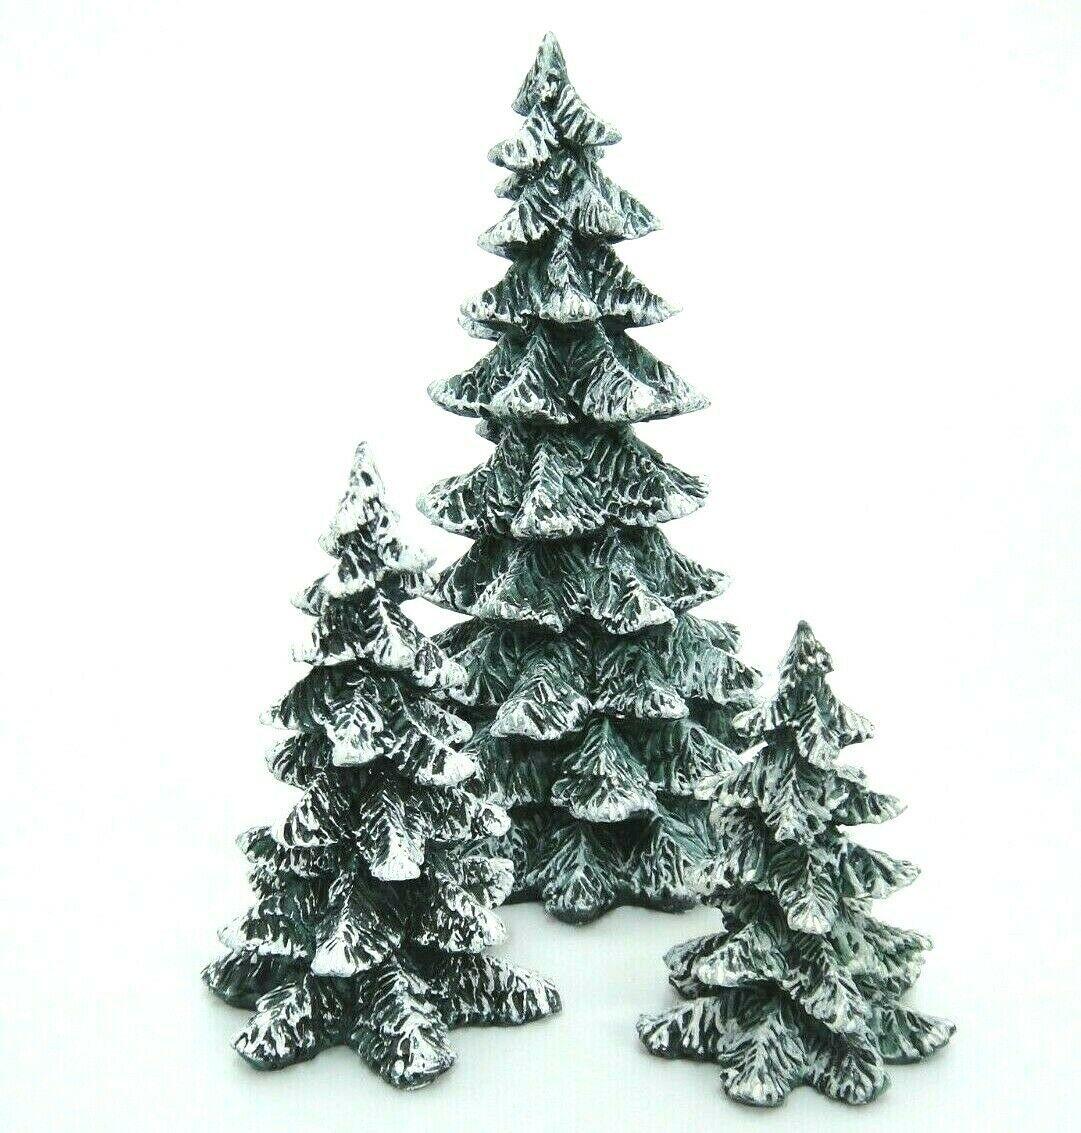 DEPT 56 SNOW VILLAGE HALLOWEEN SPOOKY BLACK GLITTER TREE Set 3 NIB